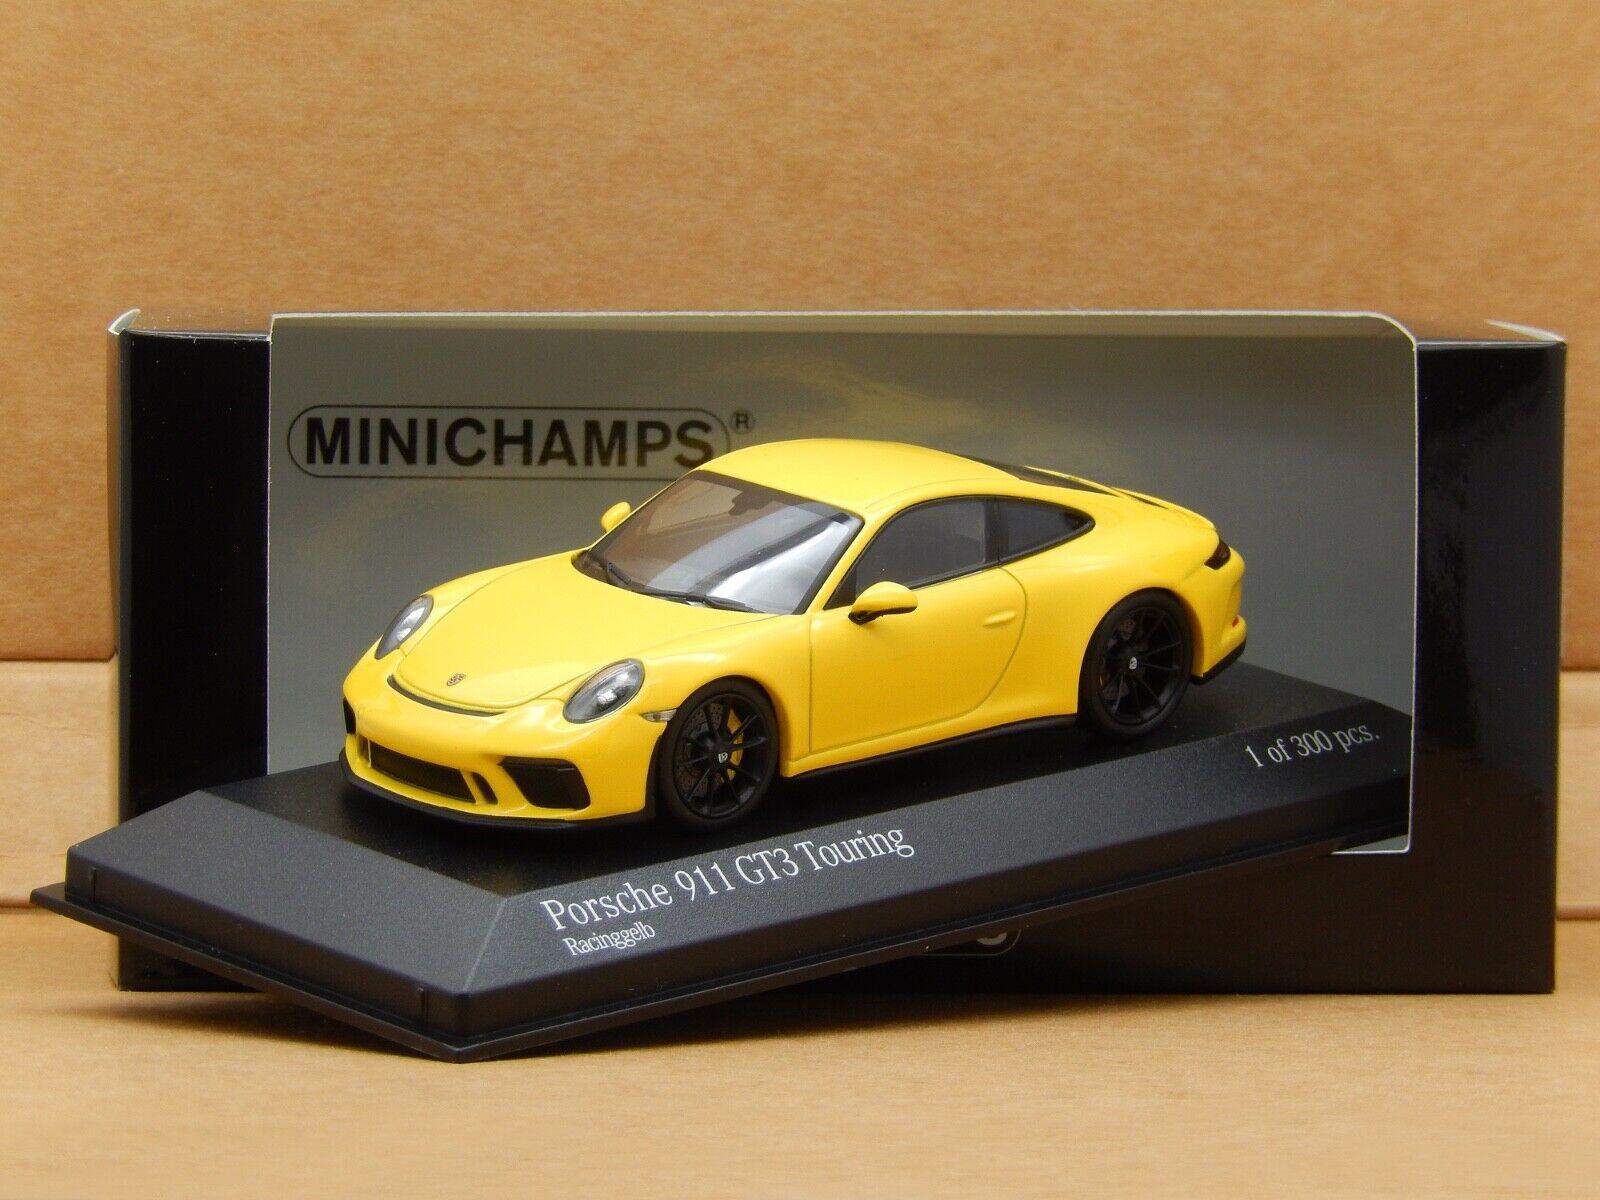 1 43 Porsche 911 GT3 Touring 991.2 Gelb Minichamps Diecast Model 410067421 New